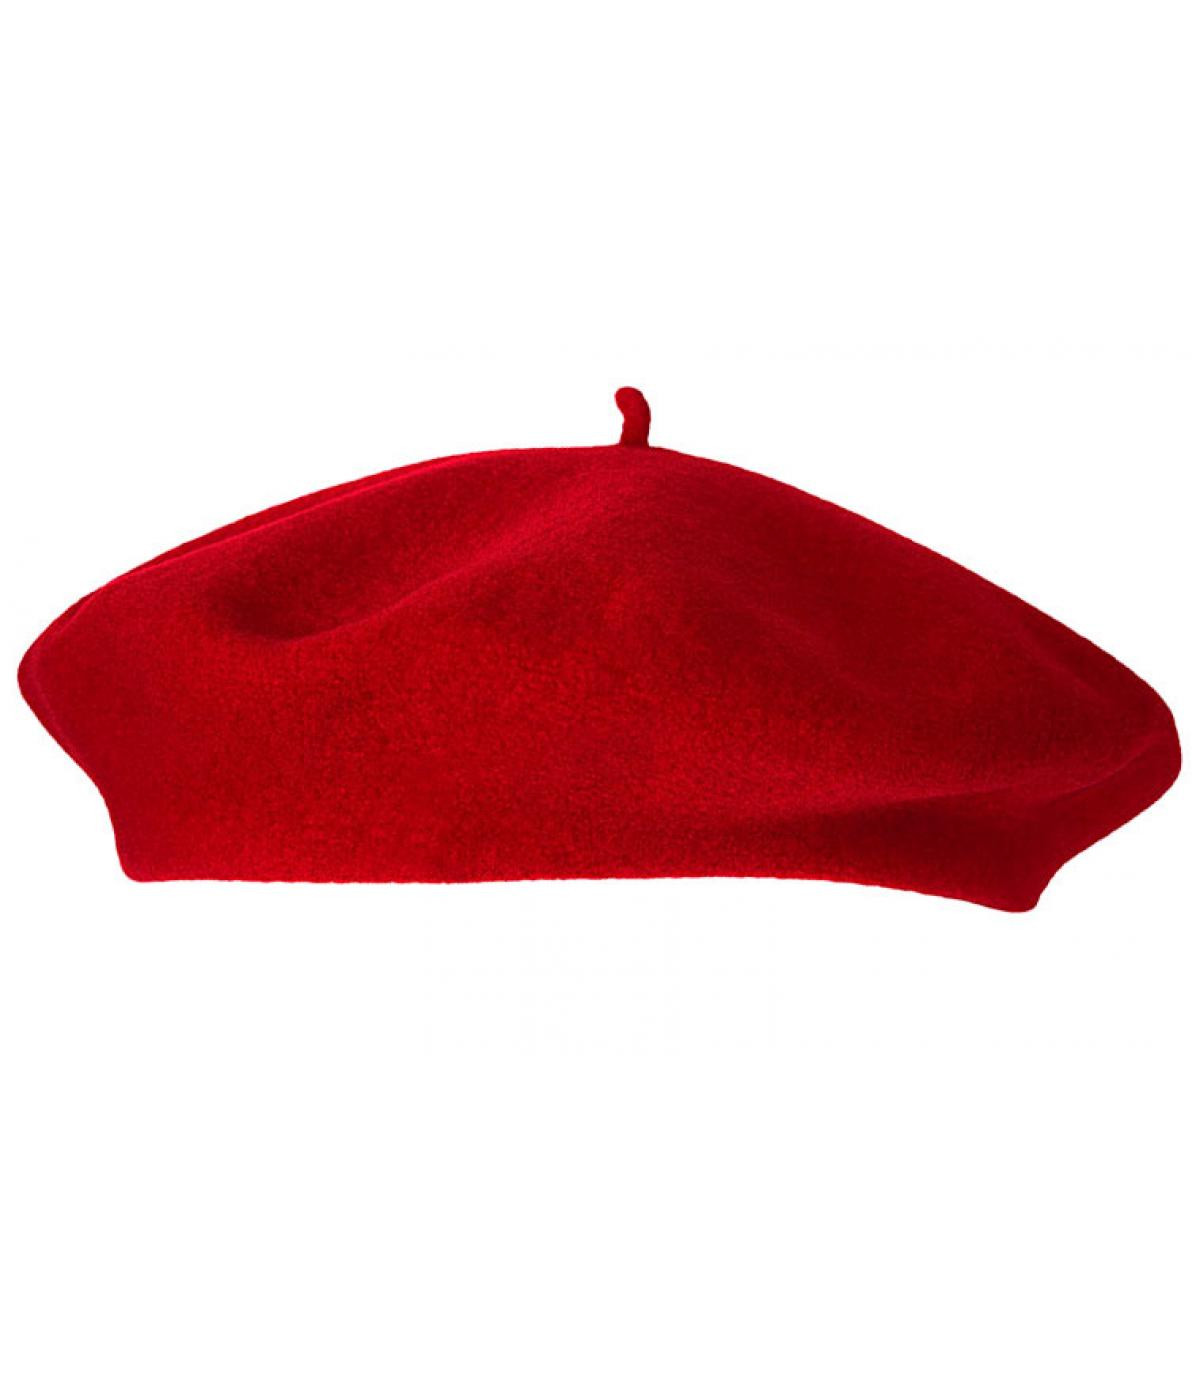 b ret rouge femme beret paris hermes par laulhere headict. Black Bedroom Furniture Sets. Home Design Ideas